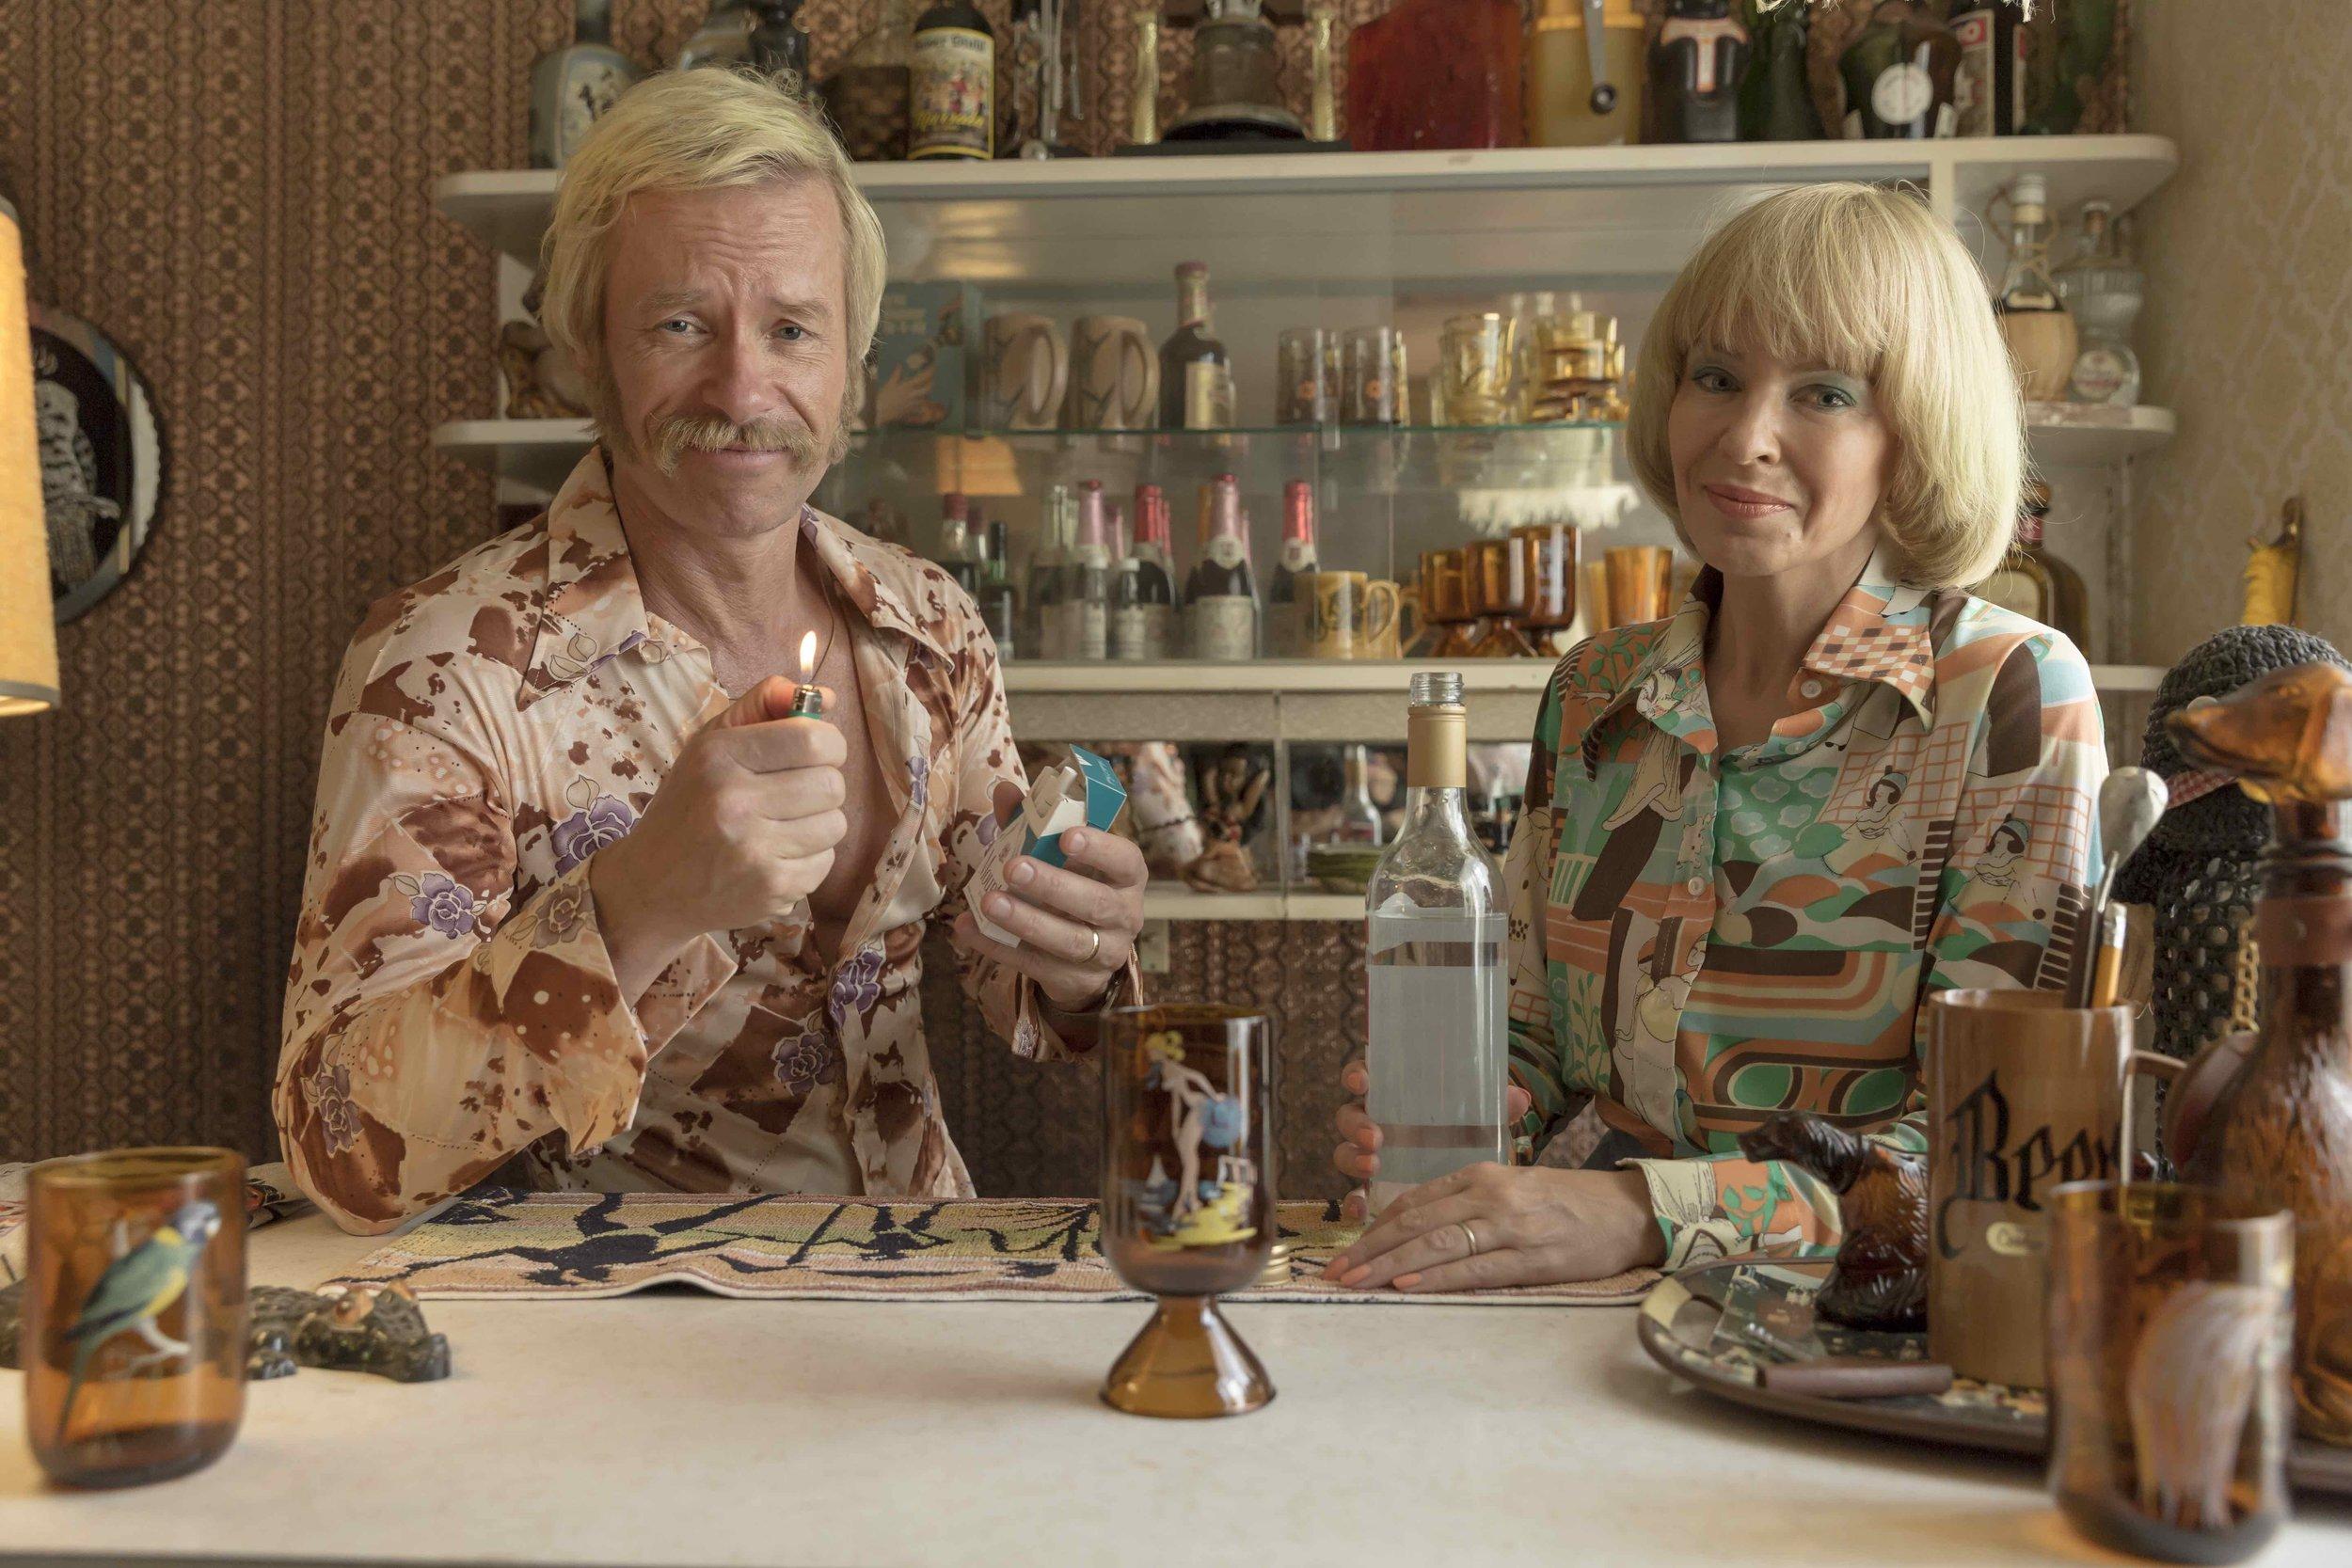 LOWRES_Keith Hall (Guy Pearce), Kaye Hall (Kylie Minogue) - Swinging Safari copy.jpg